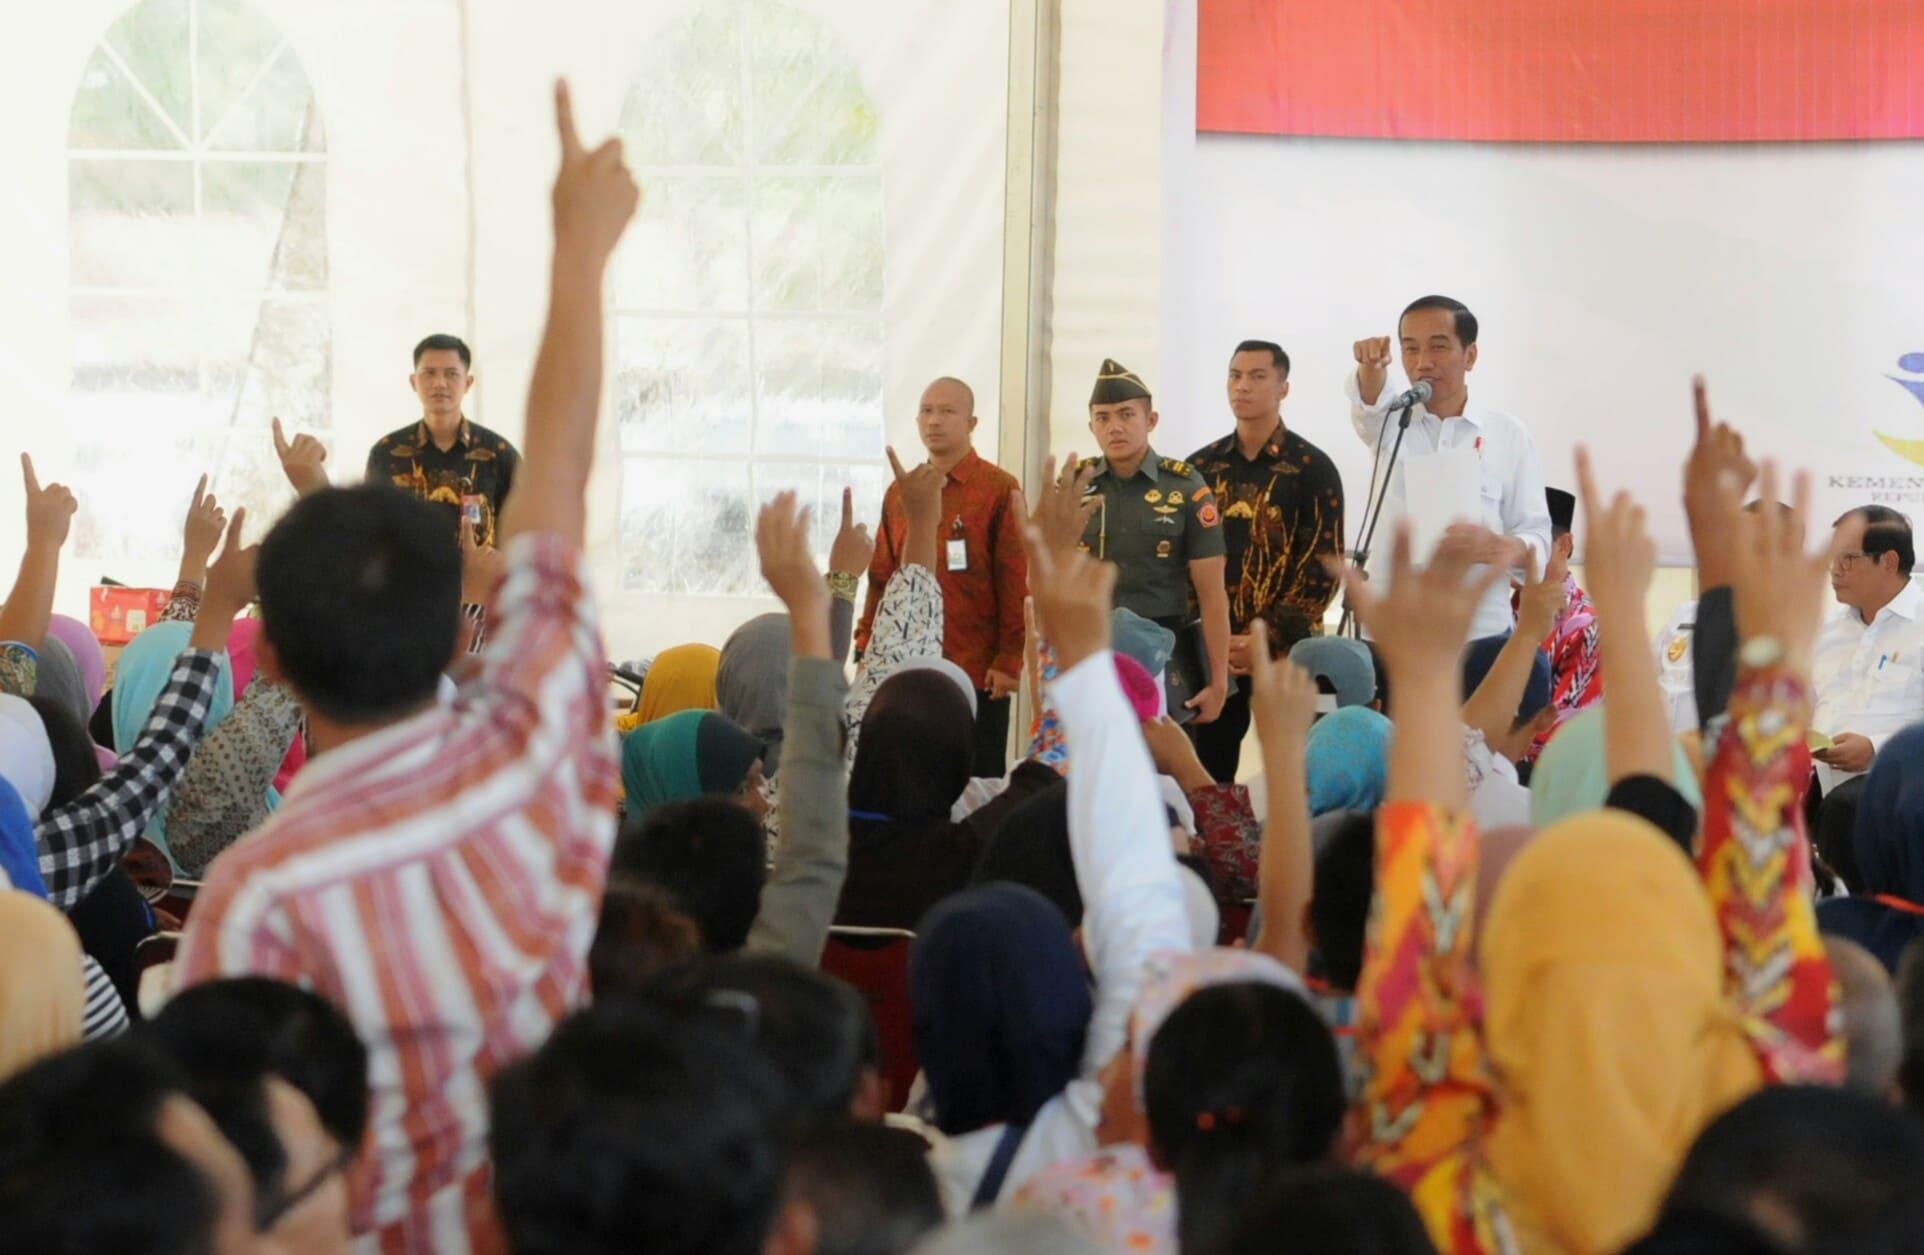 Presiden Jokowi saat bagikan KIS, KIP, PMT, dan PKH di kepada perwakilan warga di Desa Sungai Kunyit, Kecamatan Mempawah Hilir, Kabupaten Mempawah, Kalimantan Barat, Sabtu (18/3). (Foto: Humas/Rahmat)